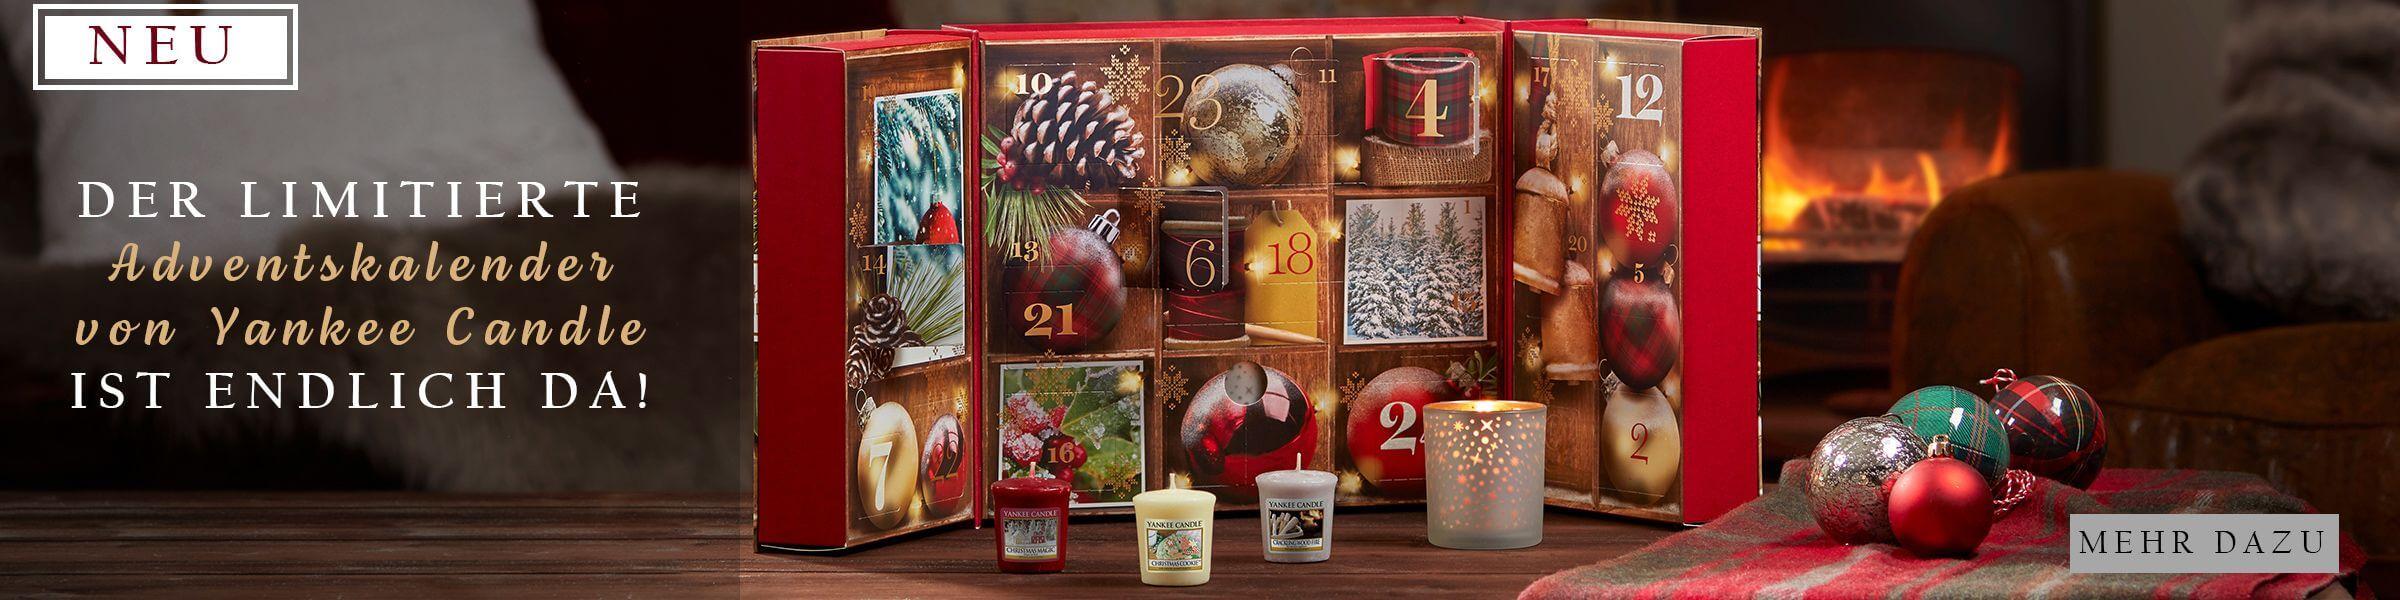 yankee-candle-advenskalender-kaufen